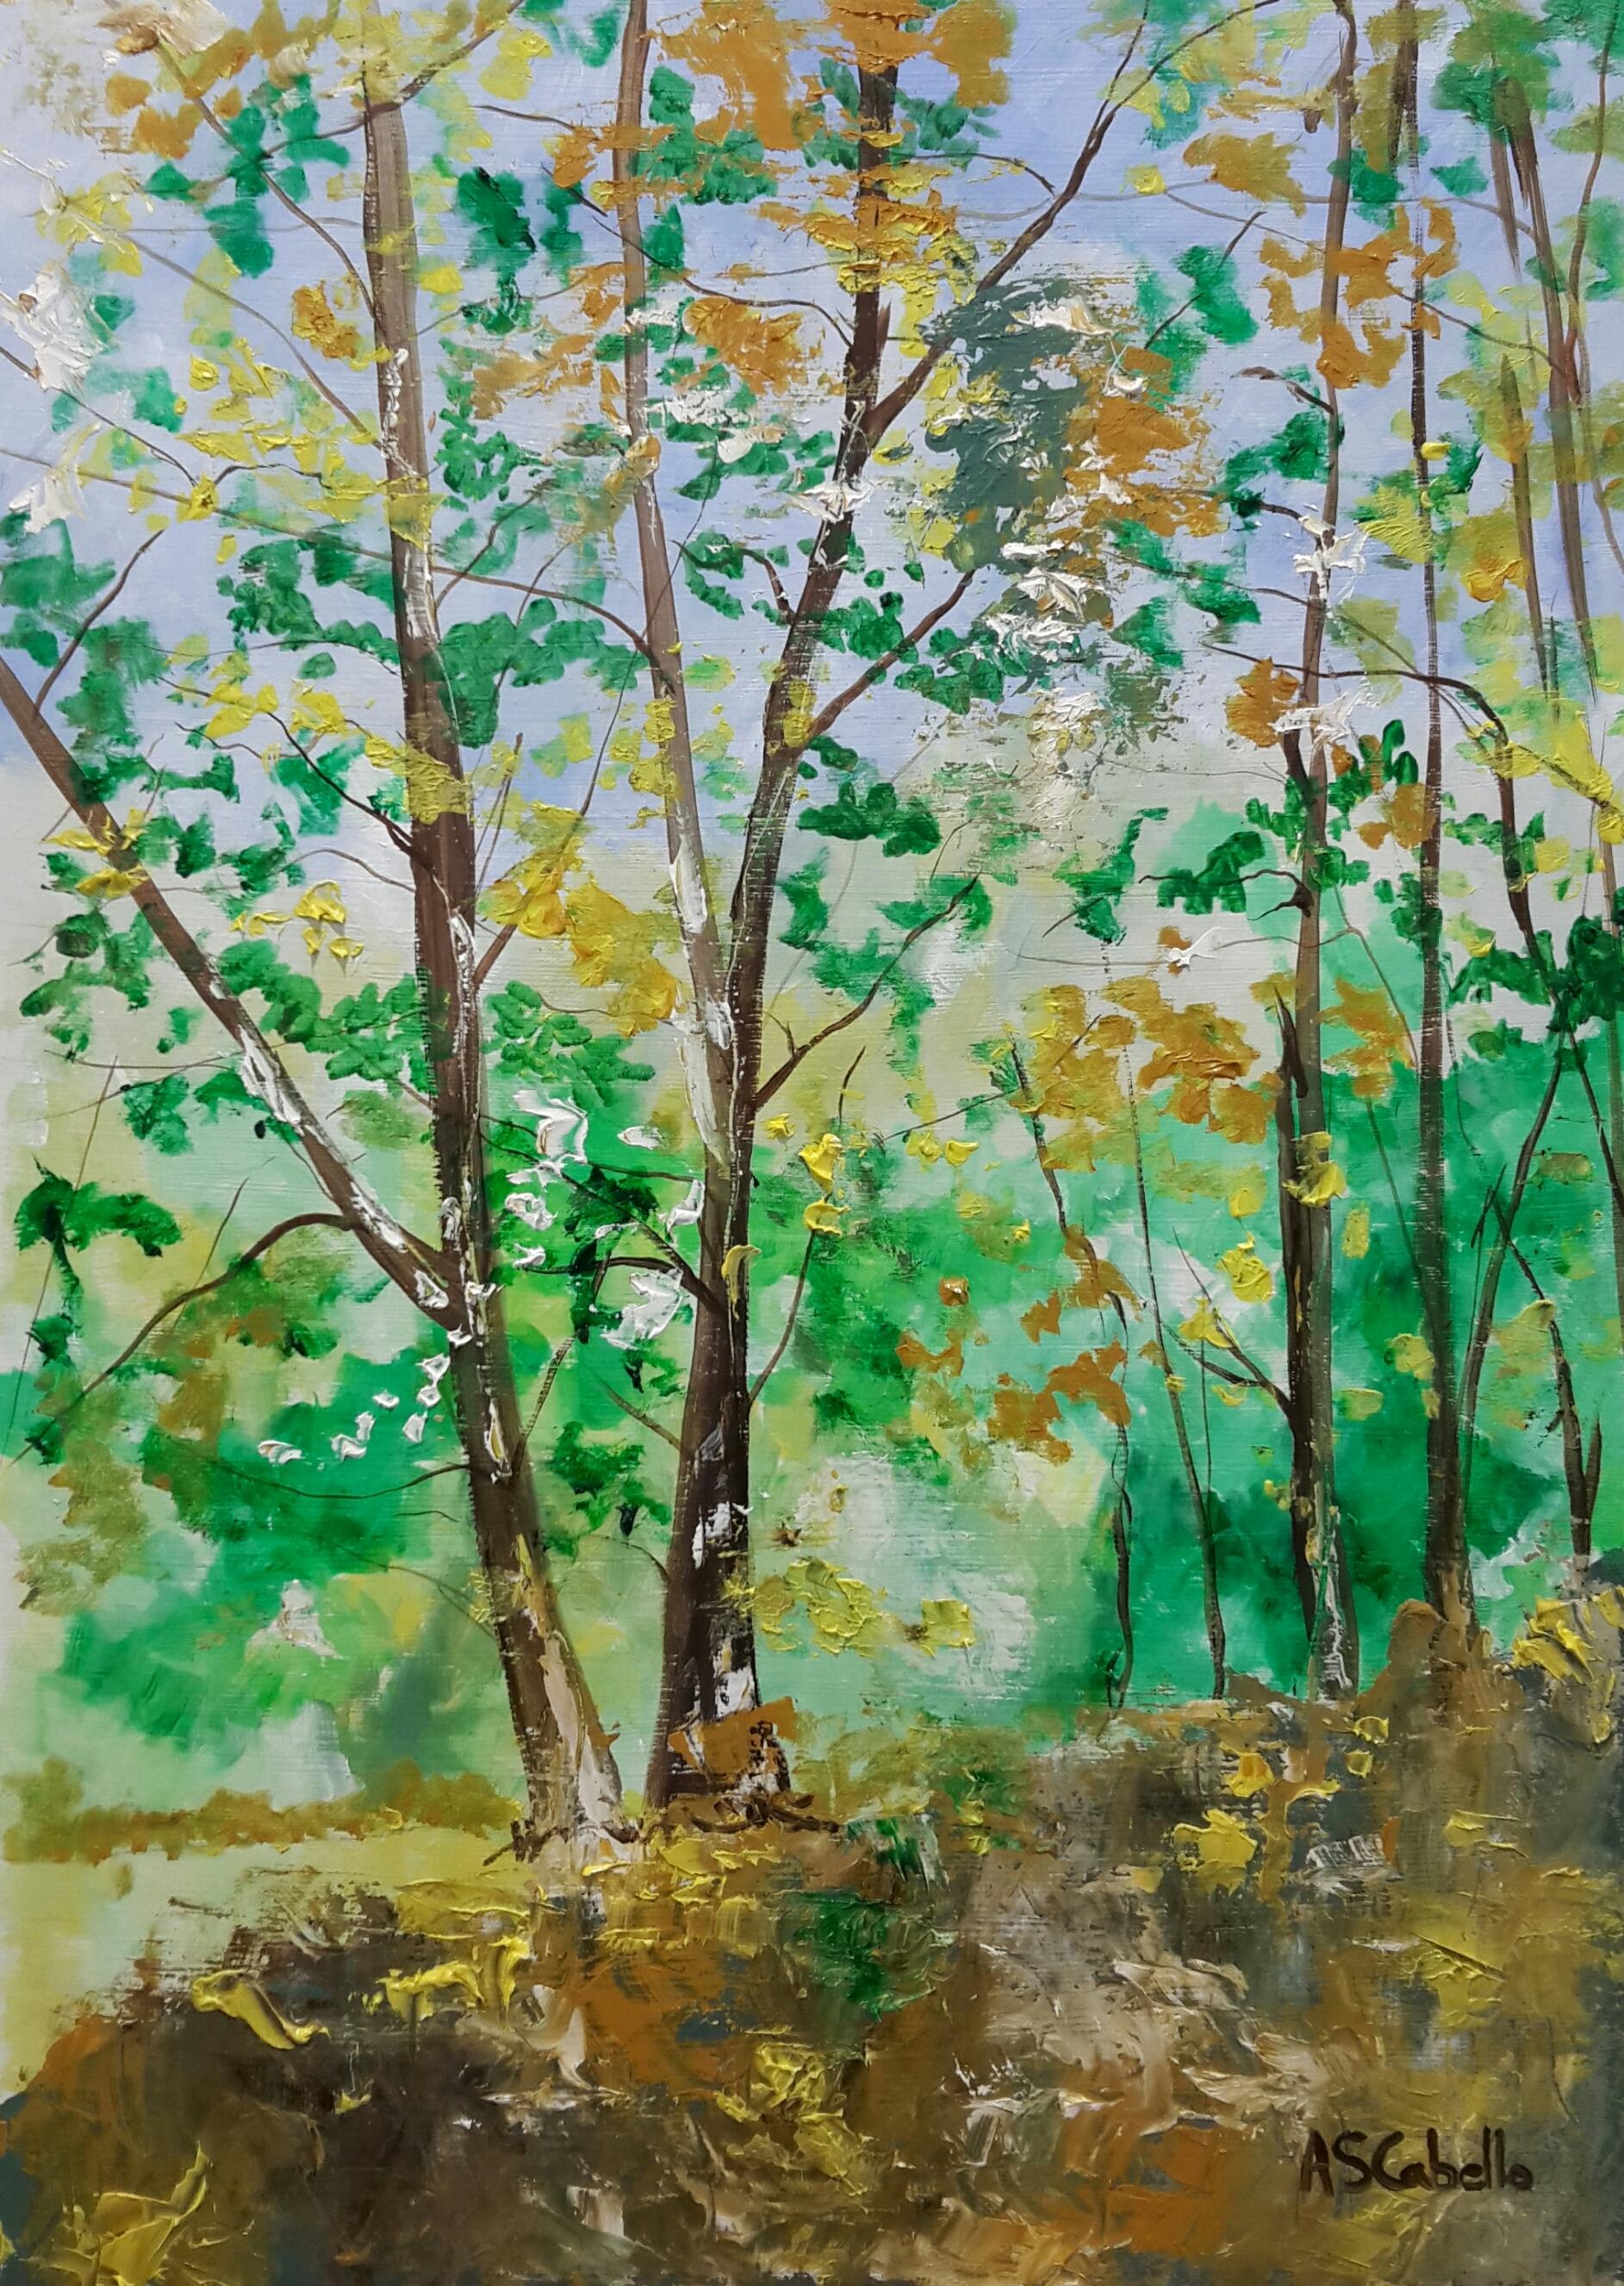 Un rincón del bosque frondoso